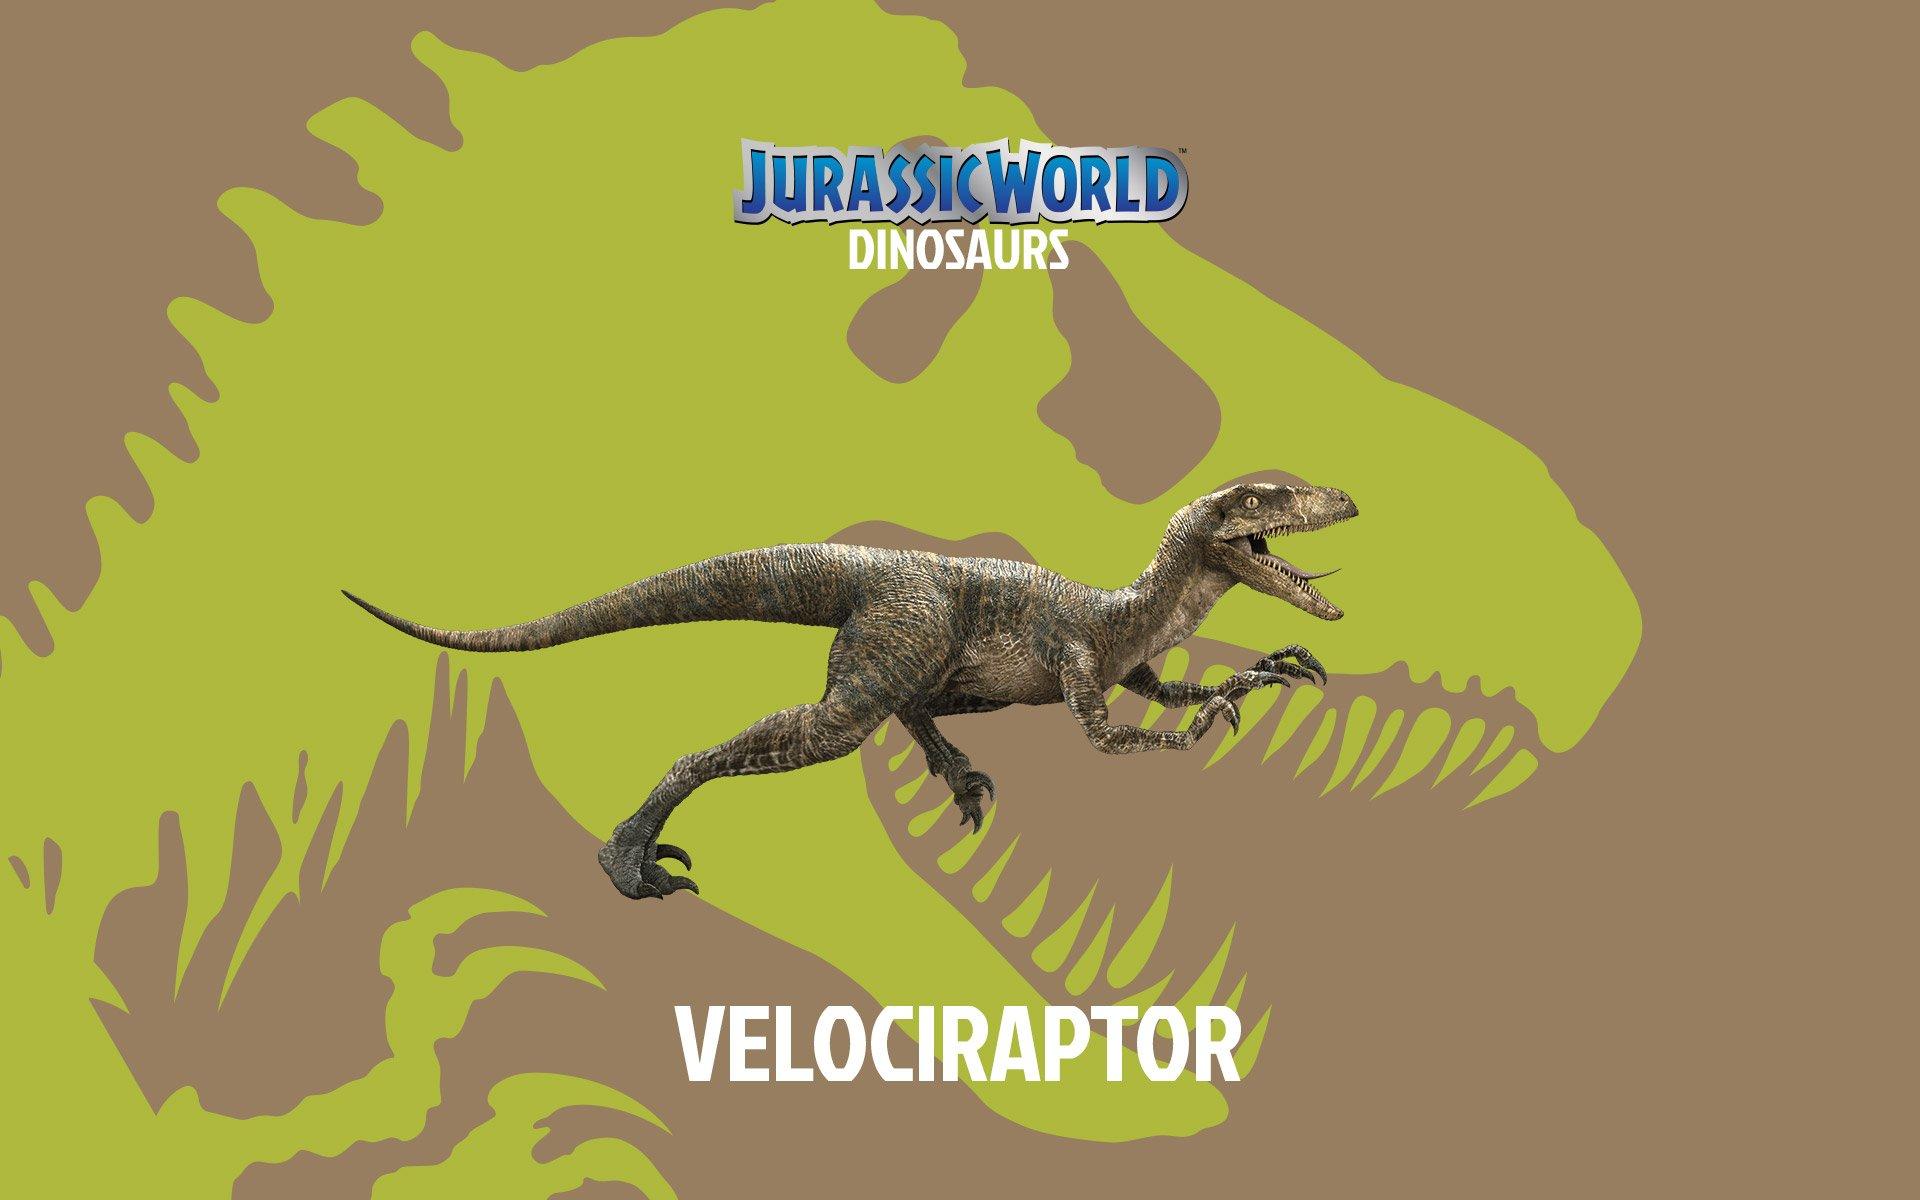 jurassic world 2015 dinosaurs desktop amp iphone 6 wallpapers hd